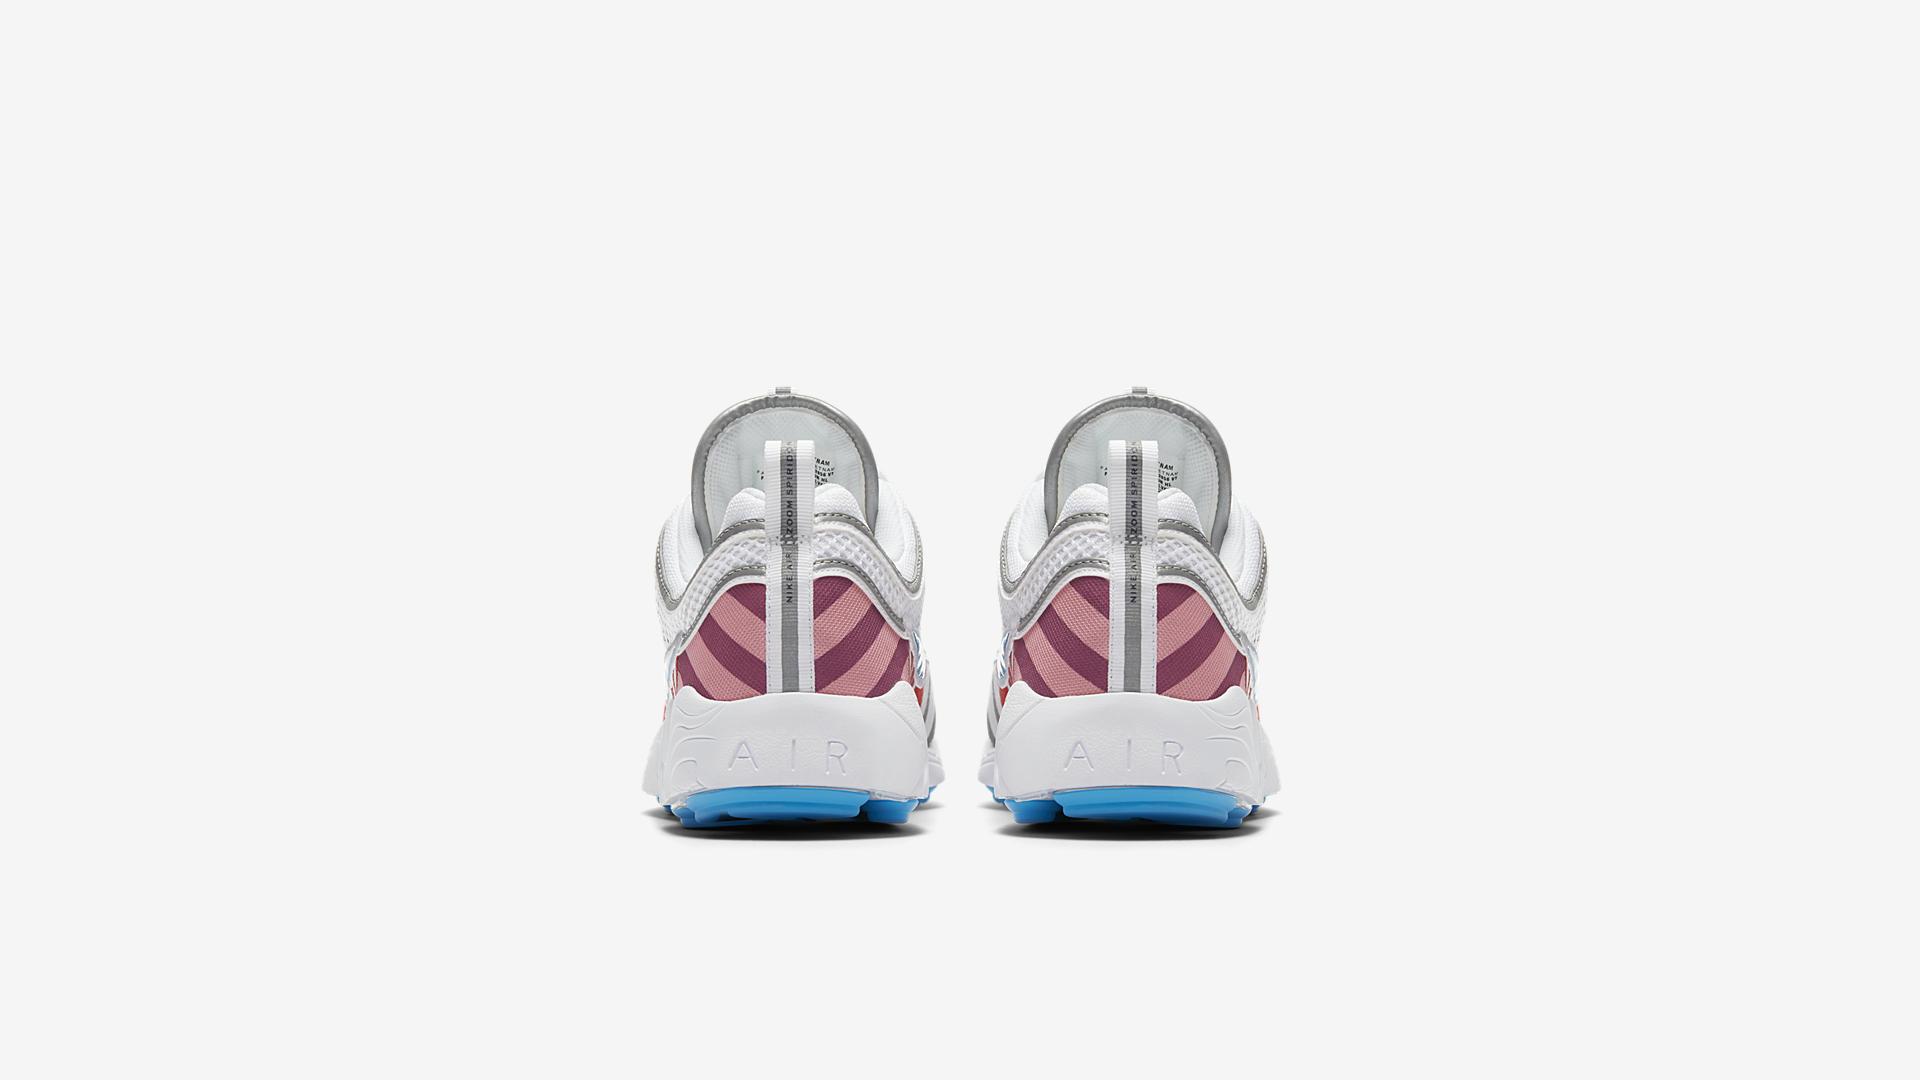 Nike x Parra Air Zoom Spiridon (AV4744-100)